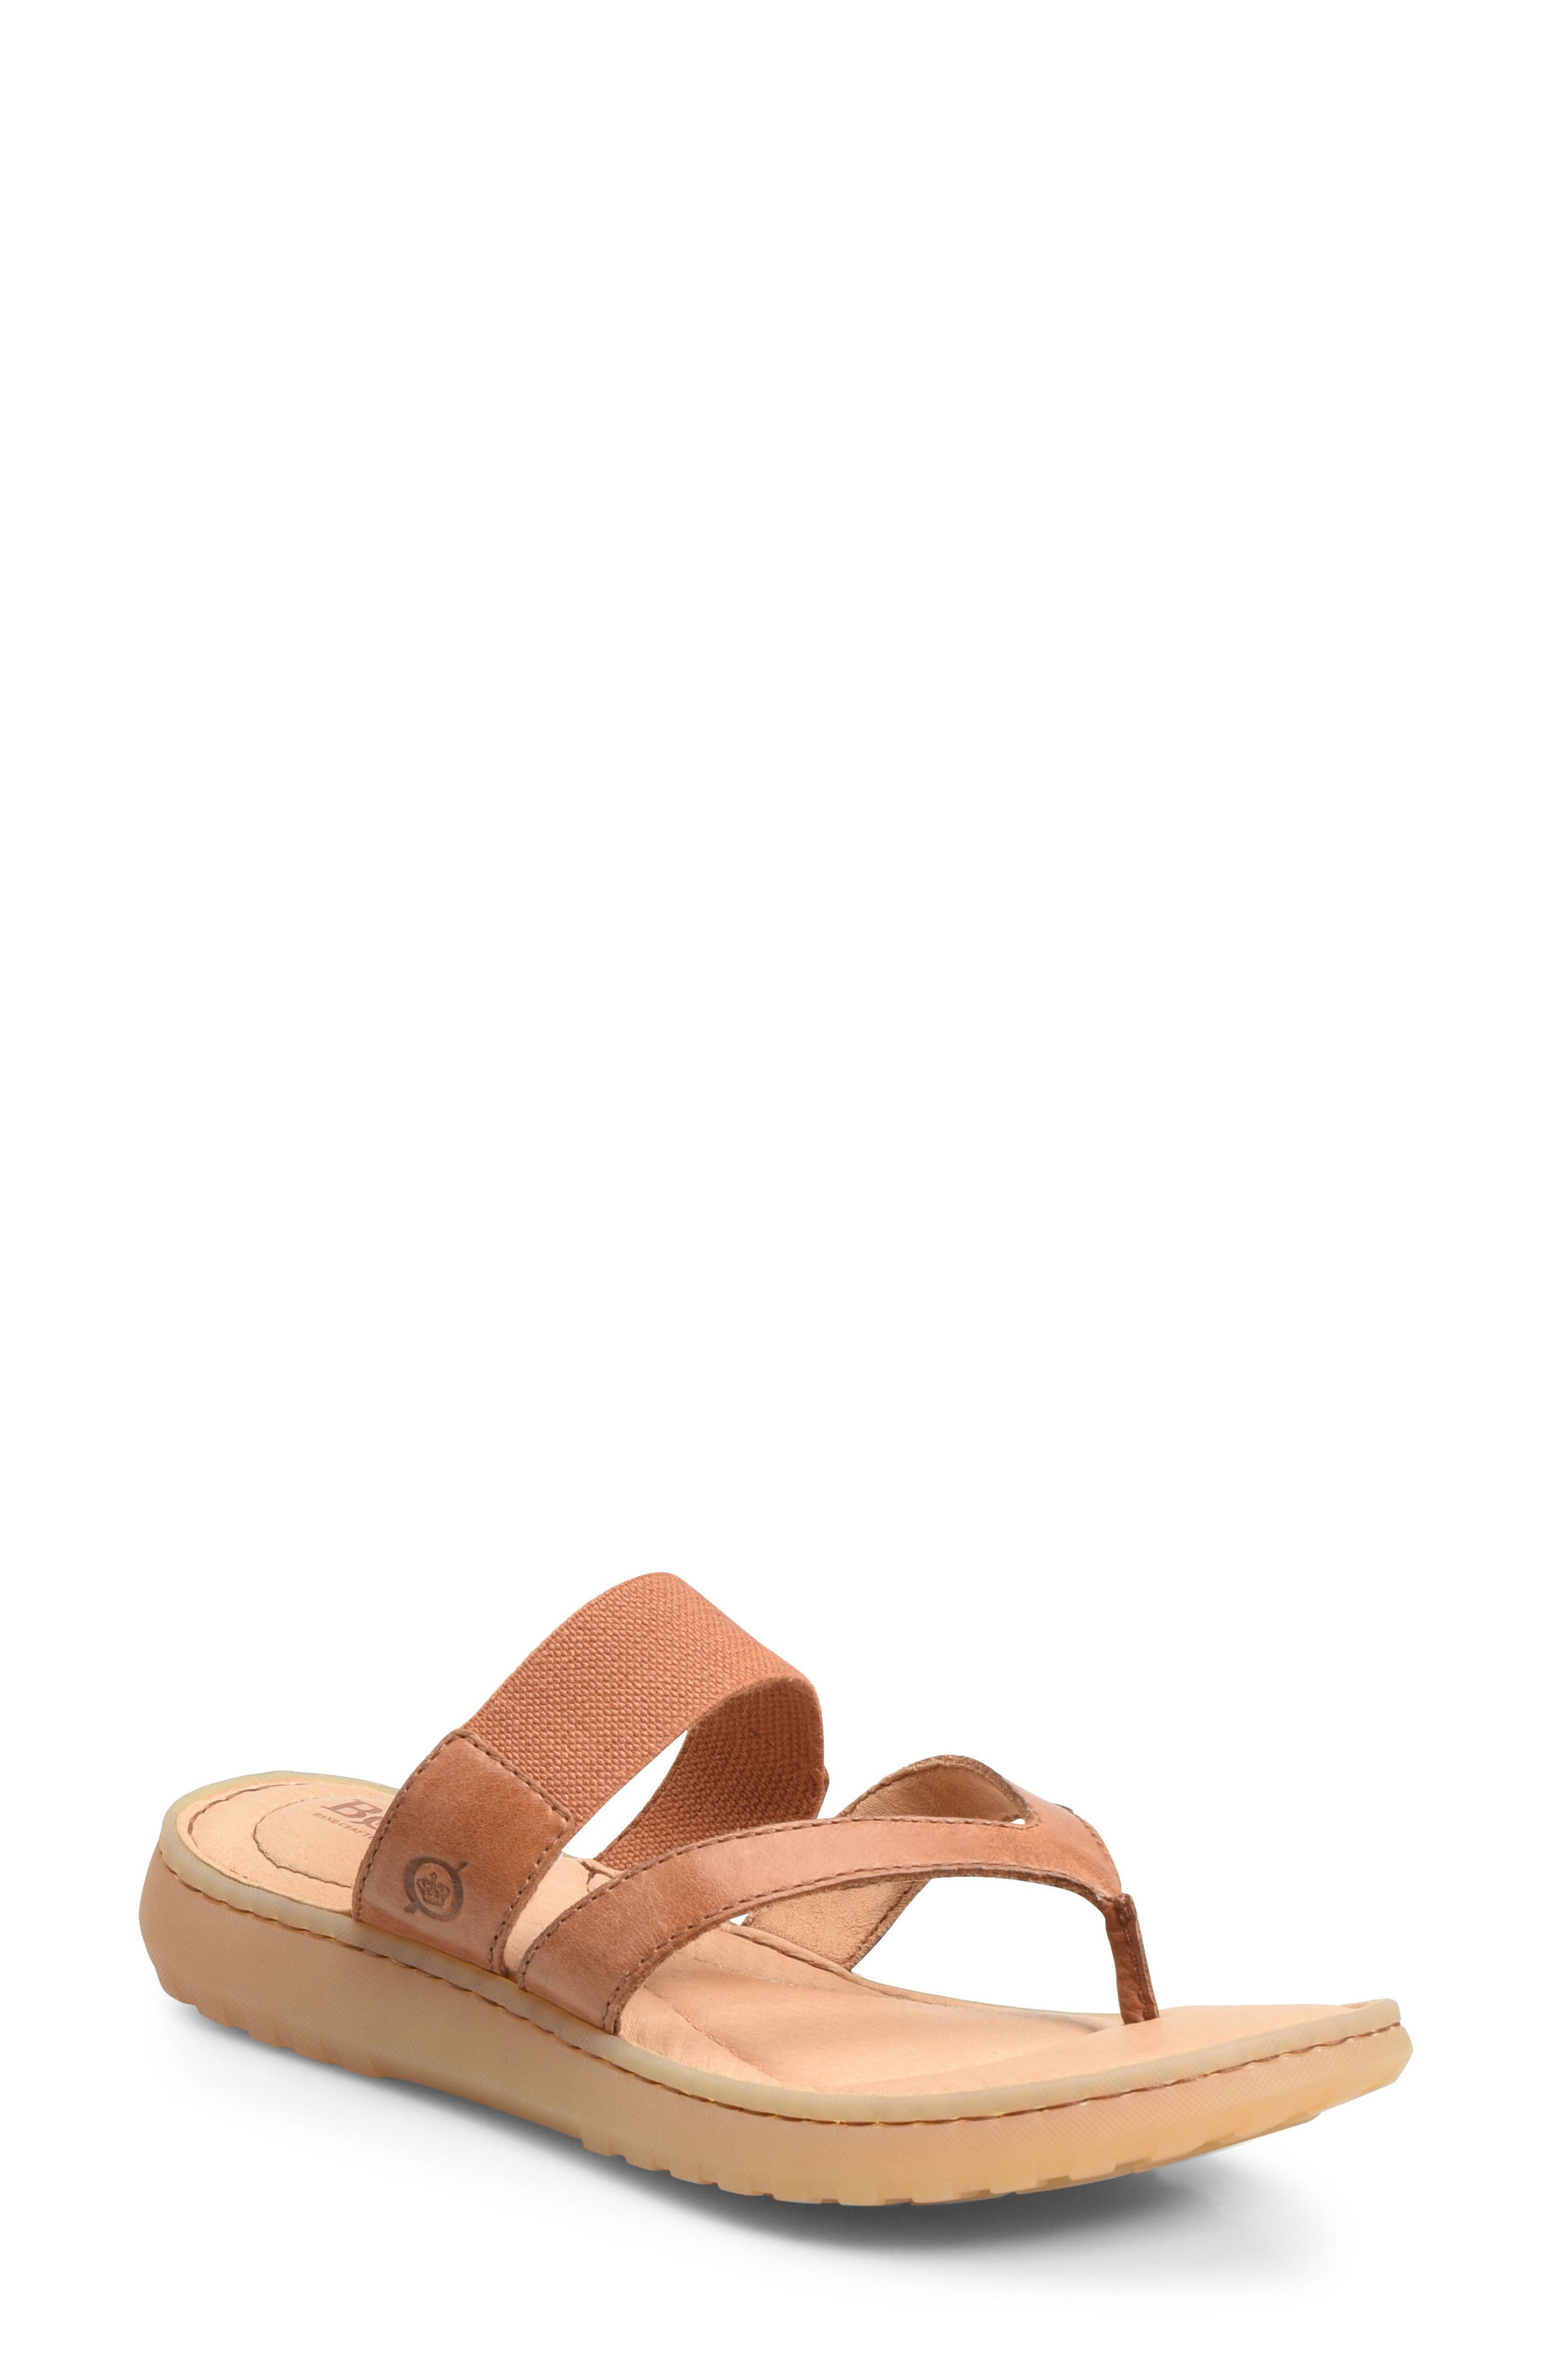 Nevis Sandal,                             Main thumbnail 1, color,                             Brown Leather